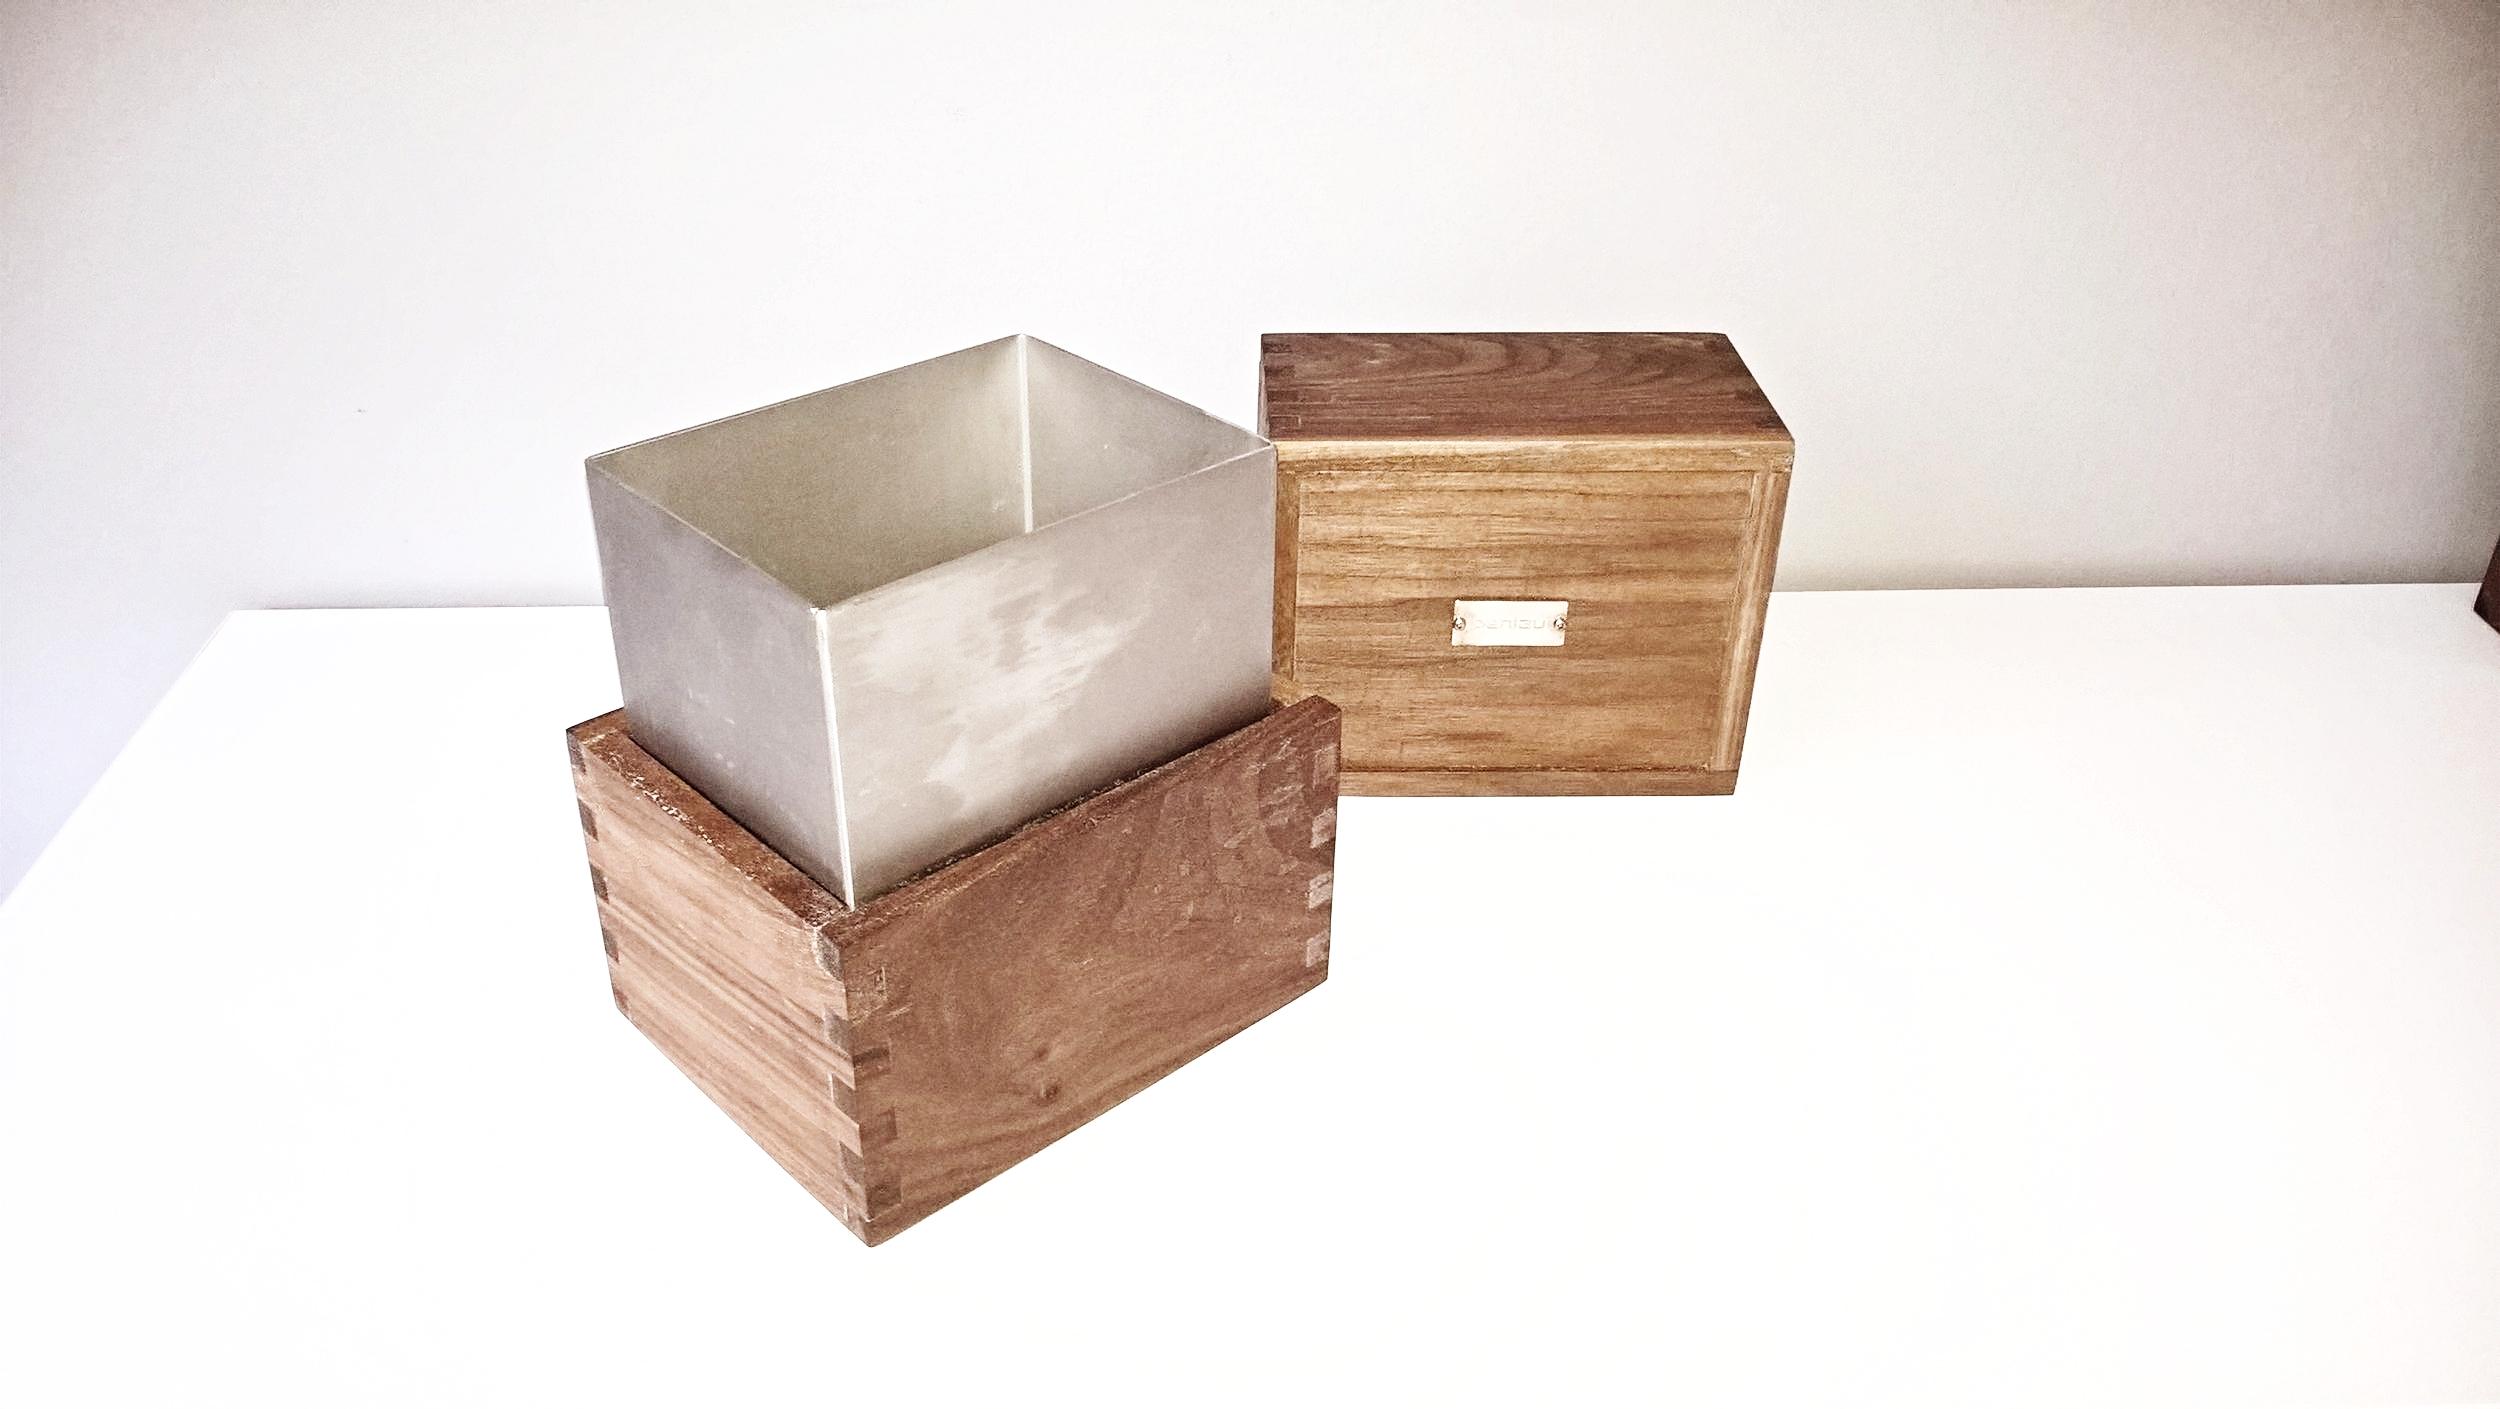 Penlau®  dishbox - medium Træ box, olieret valnød 15,5/12,5/9 cm (b/d/h) stål box, børstet rustfrit stål 13,2/10,215,5 cm (b/d/h) Låg til box, olieret valnød 15,5/12,5/9 cm (b/d/h) Et sæt af 3 dele kr. 975,- En del kr. 350,- Varenr. Box3-555-01-medium